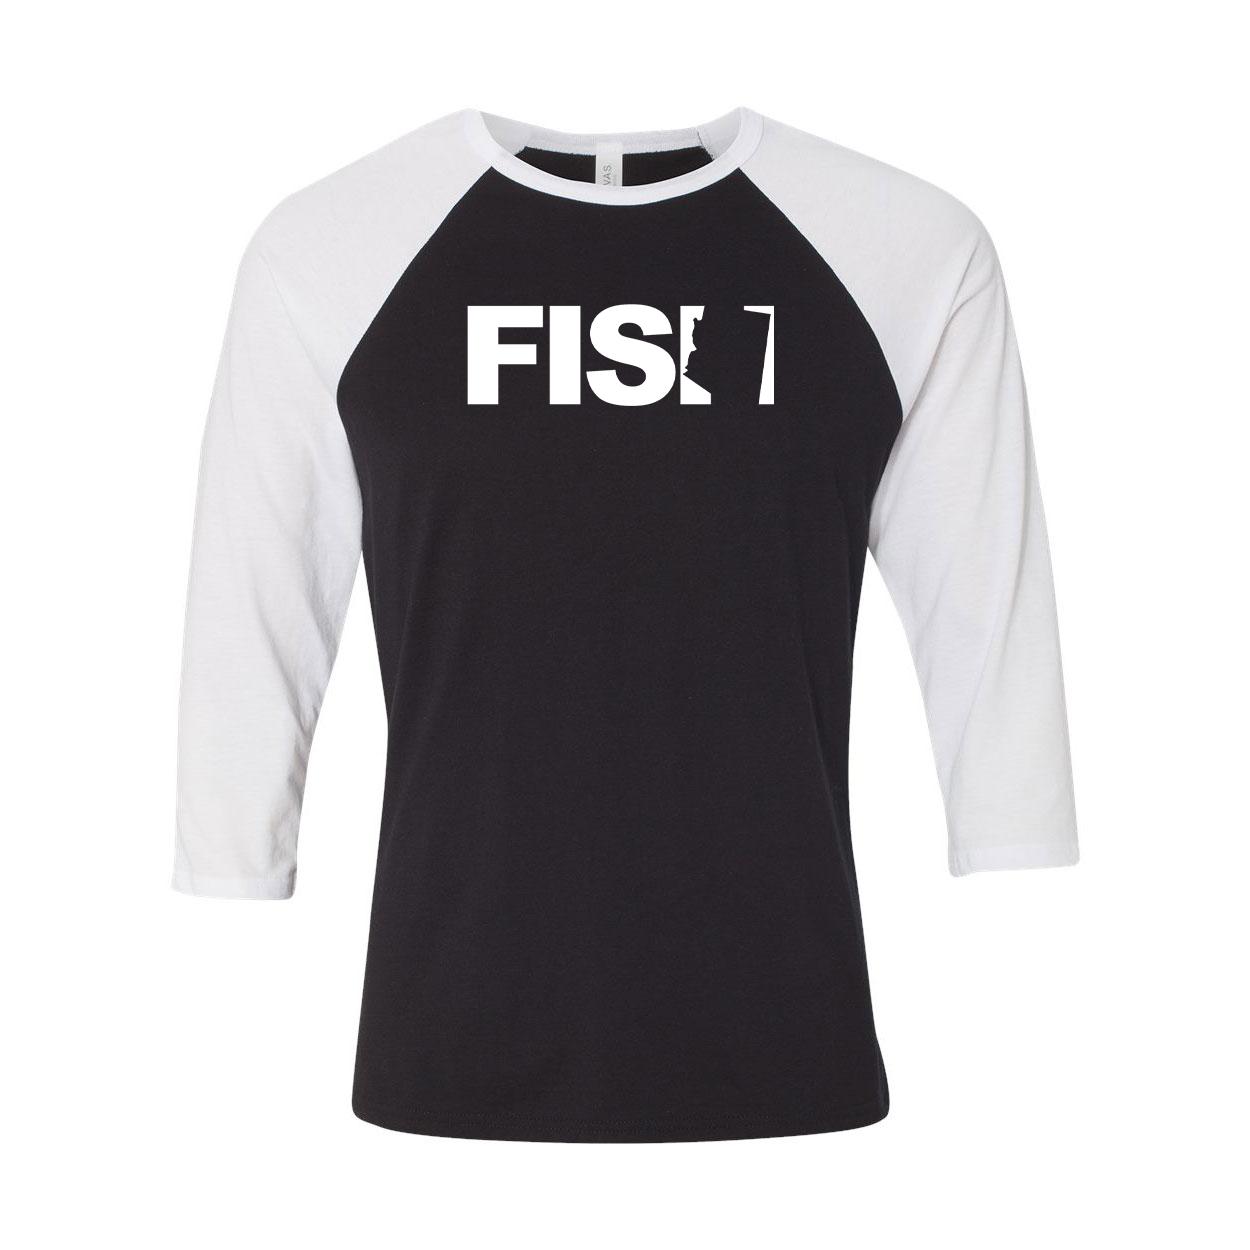 Fish Arizona Classic Raglan Shirt Black/White (White Logo)